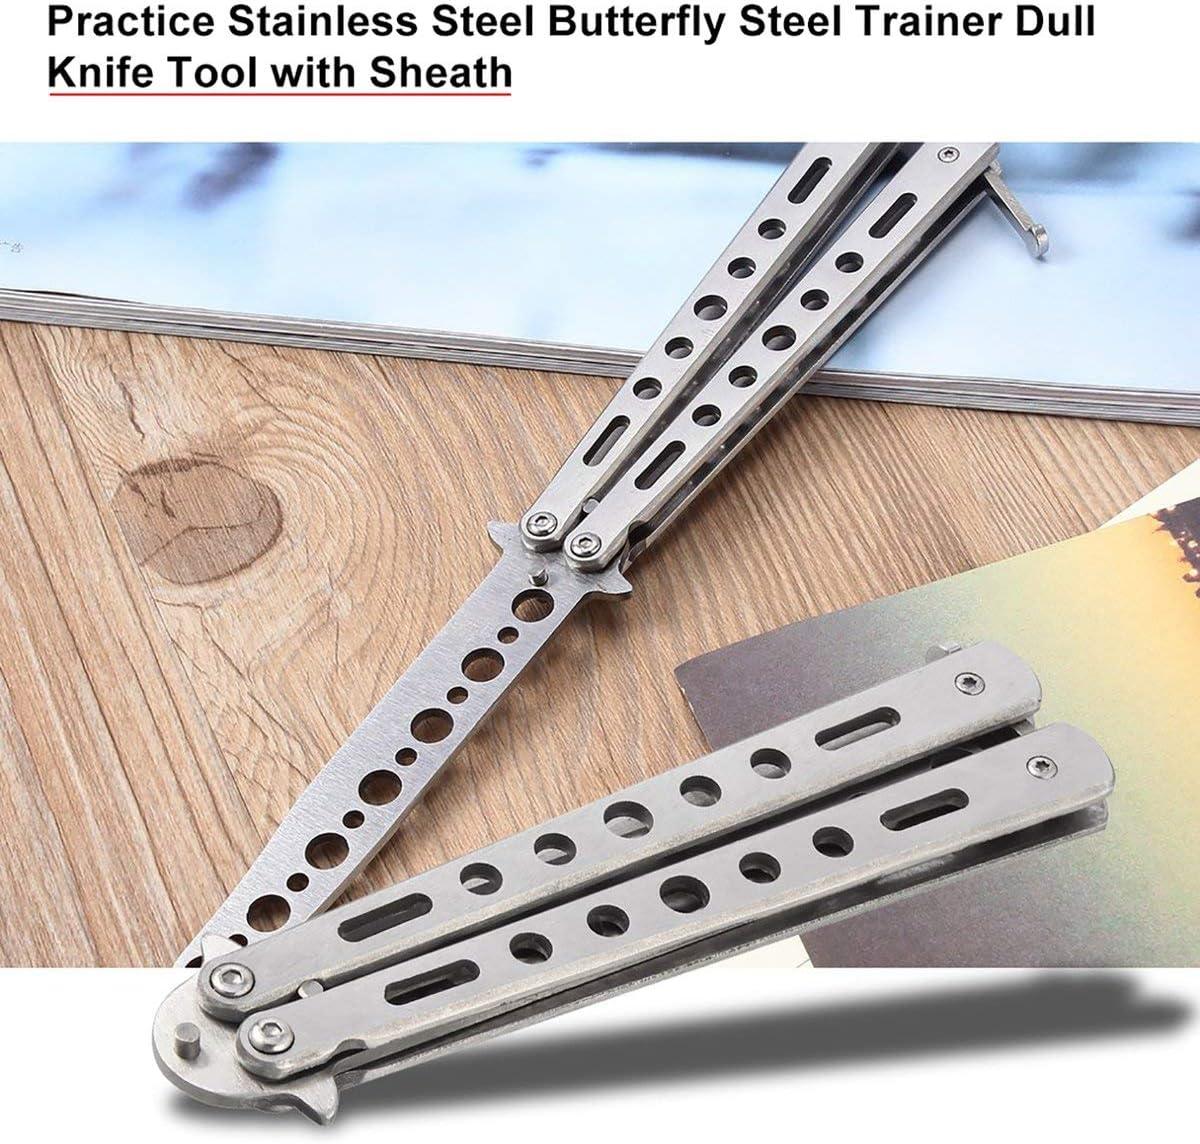 Silber Silber Metall Praxis Butterfly Trainer Trainingsmesser Dull Tool mit Scheide Klappmesser Dull Tool Outdoor Campingmesser